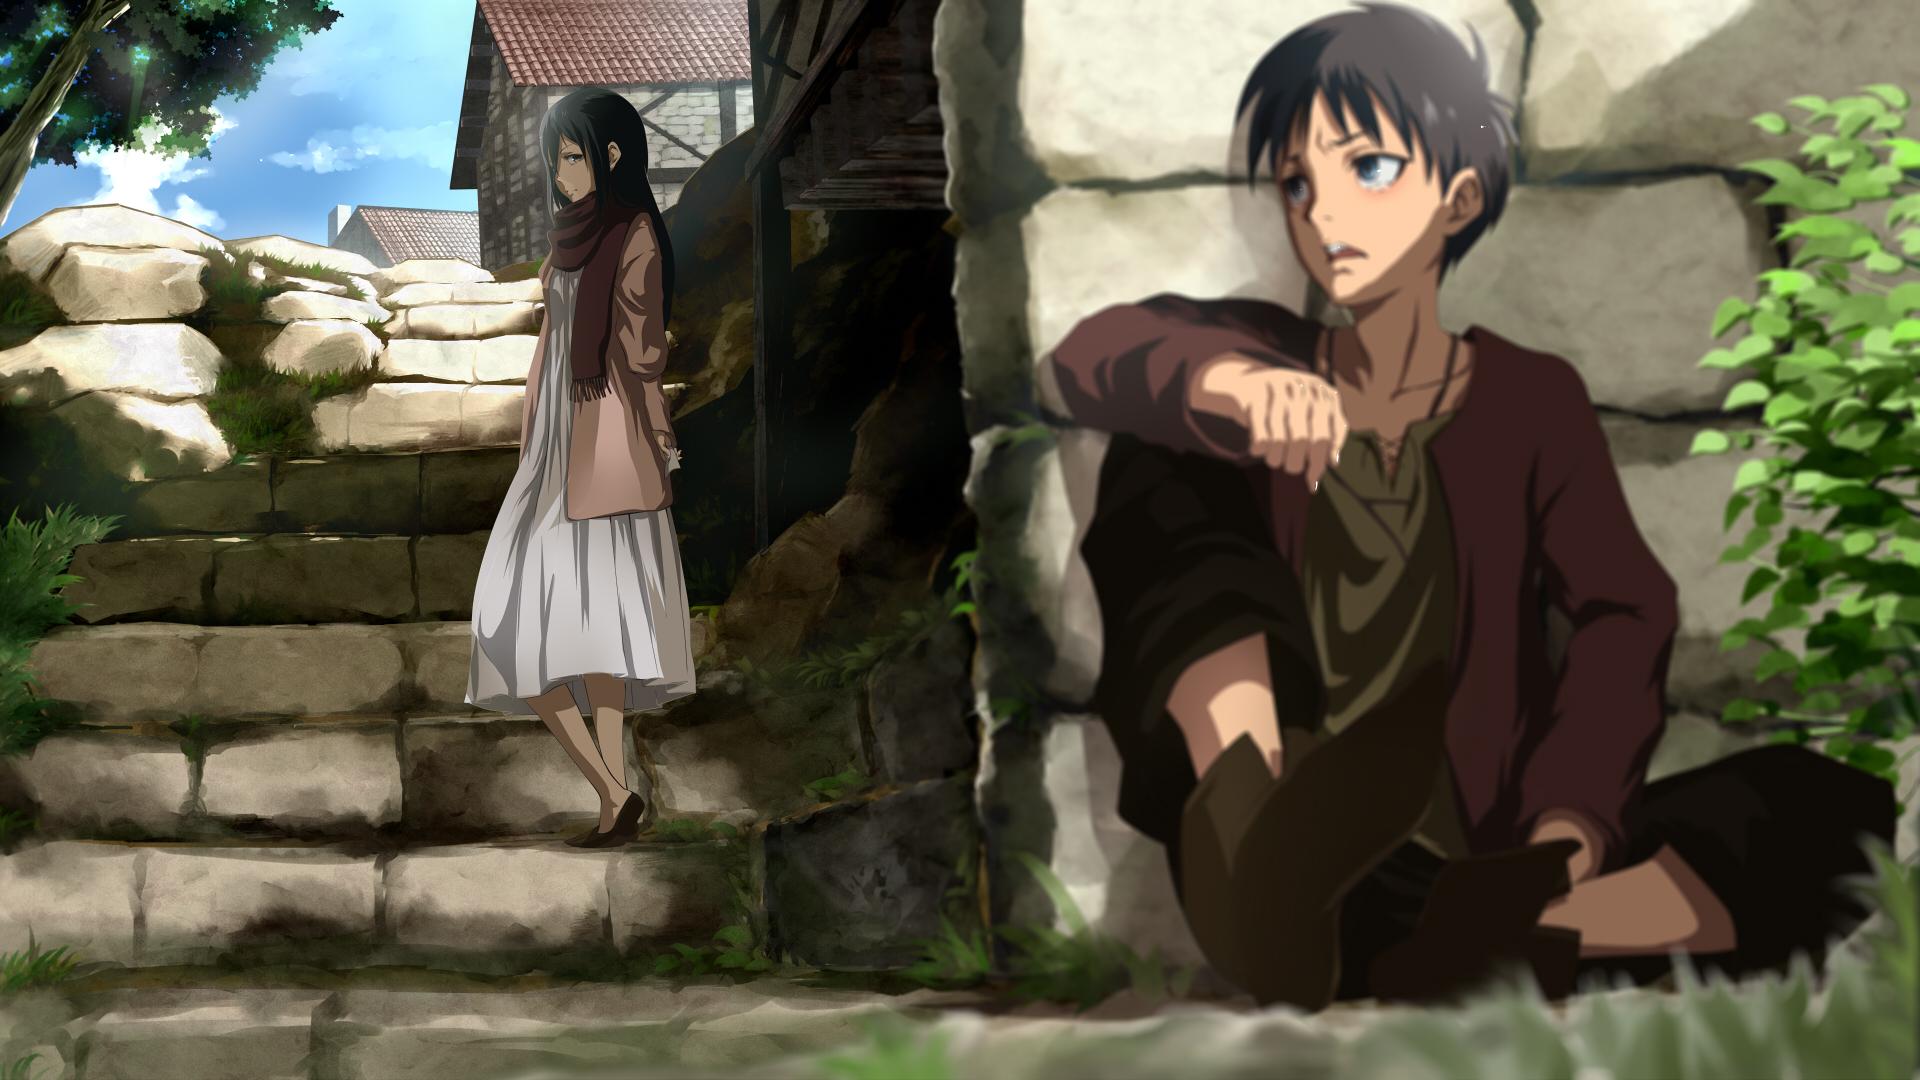 Attack on Titan HD Wallpaper #1491426 - Zerochan Anime ...